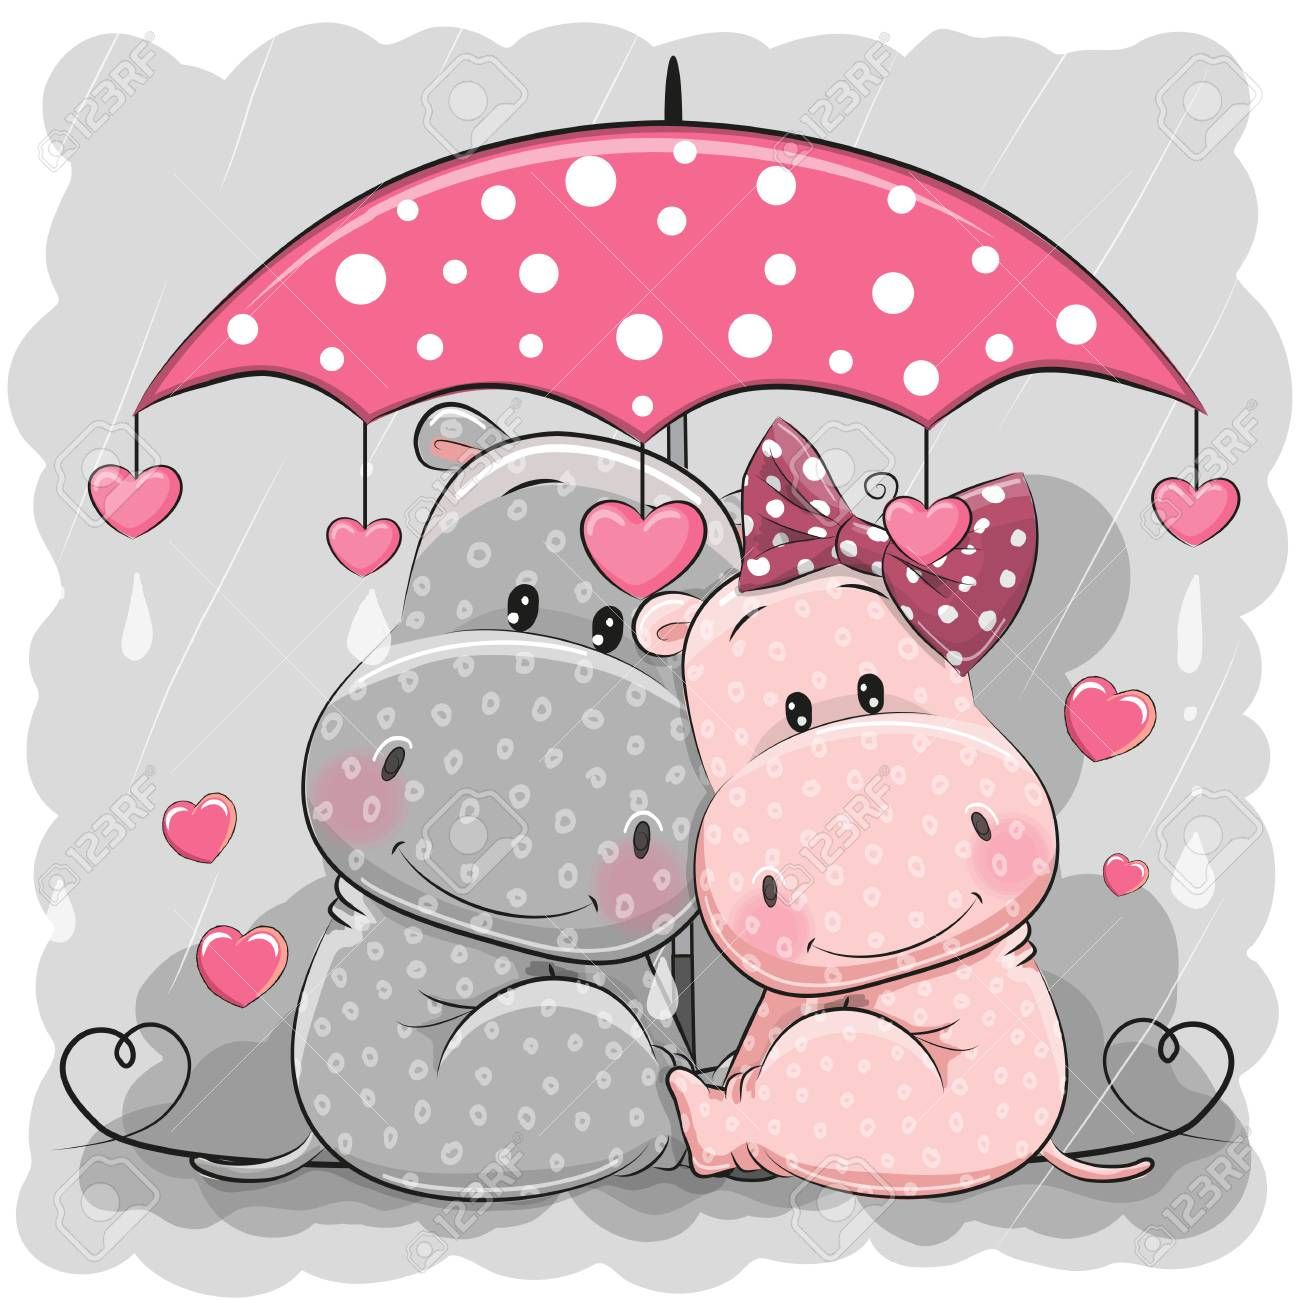 Two Cute Cartoon Hippos With Umbrella Under The Rain Illustration Sponsored Hippos Cartoon Cute I Cartoon Hippo Baby Elephant Cartoon Cute Drawings